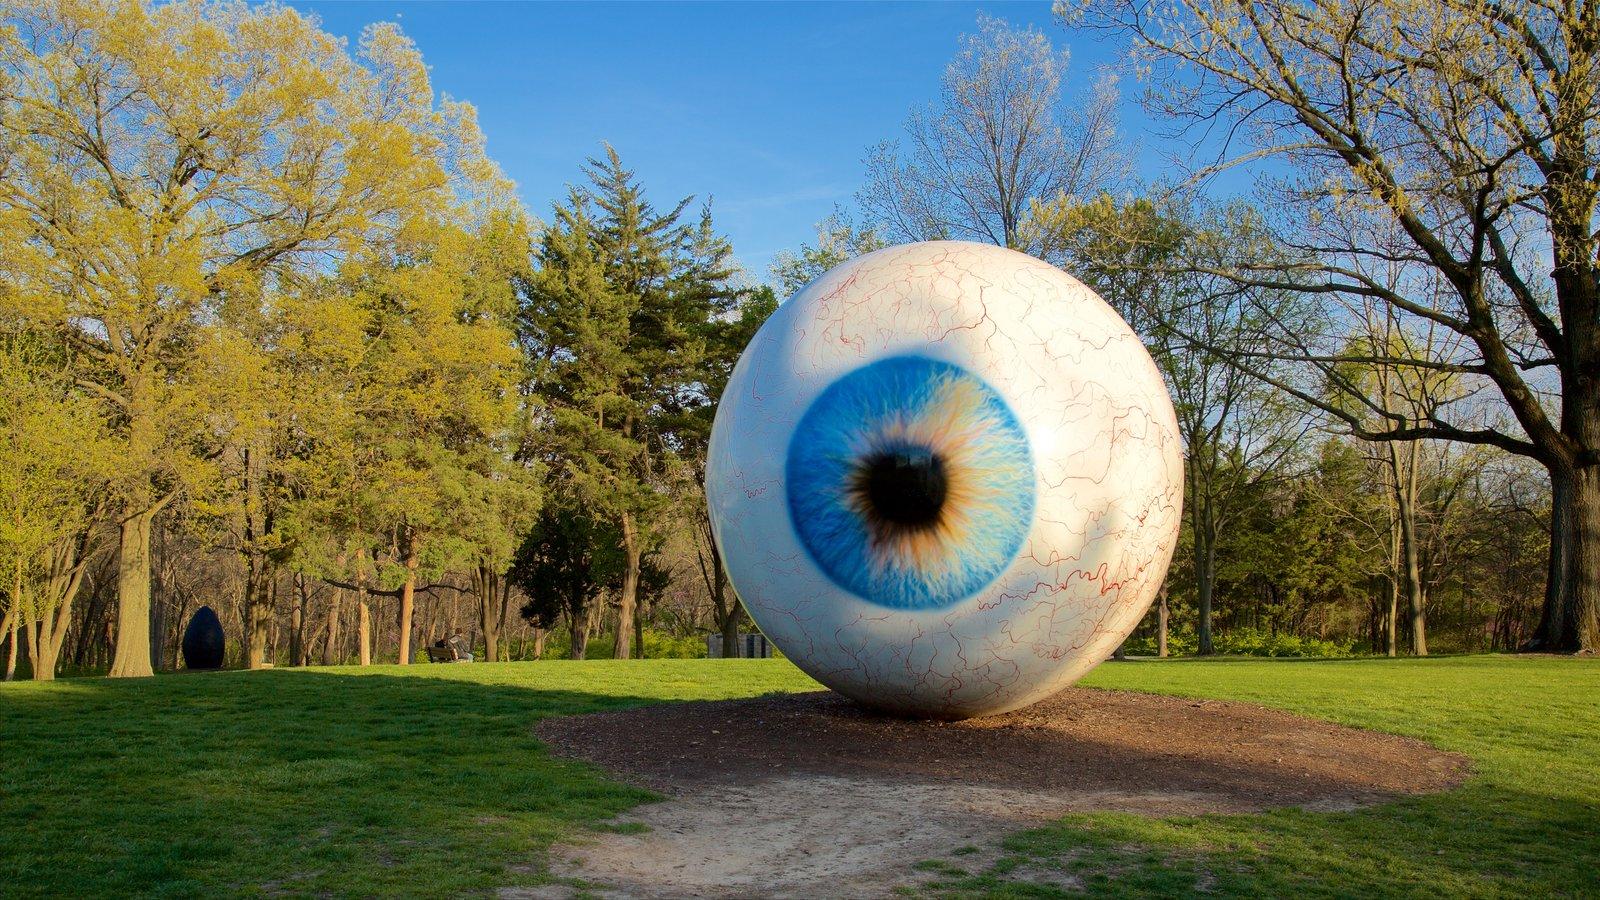 Laumeier Sculpture Park Which Includes A Park And Outdoor Art